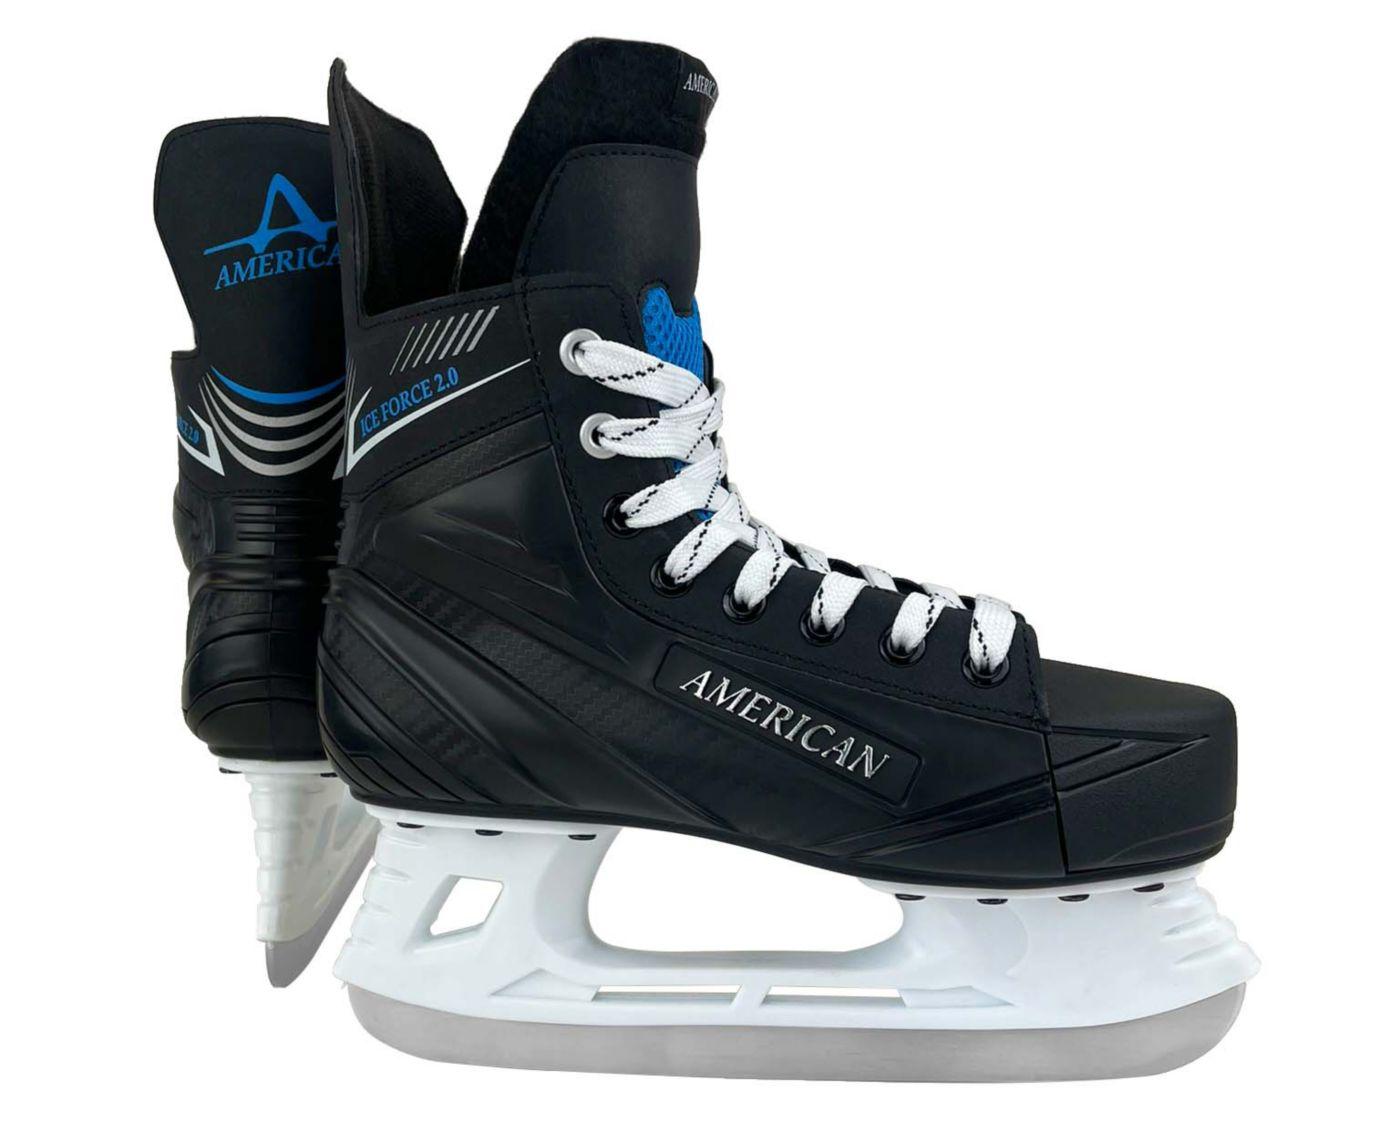 American Athletic Shoe Junior Ice Force 2.0 Hockey Skate